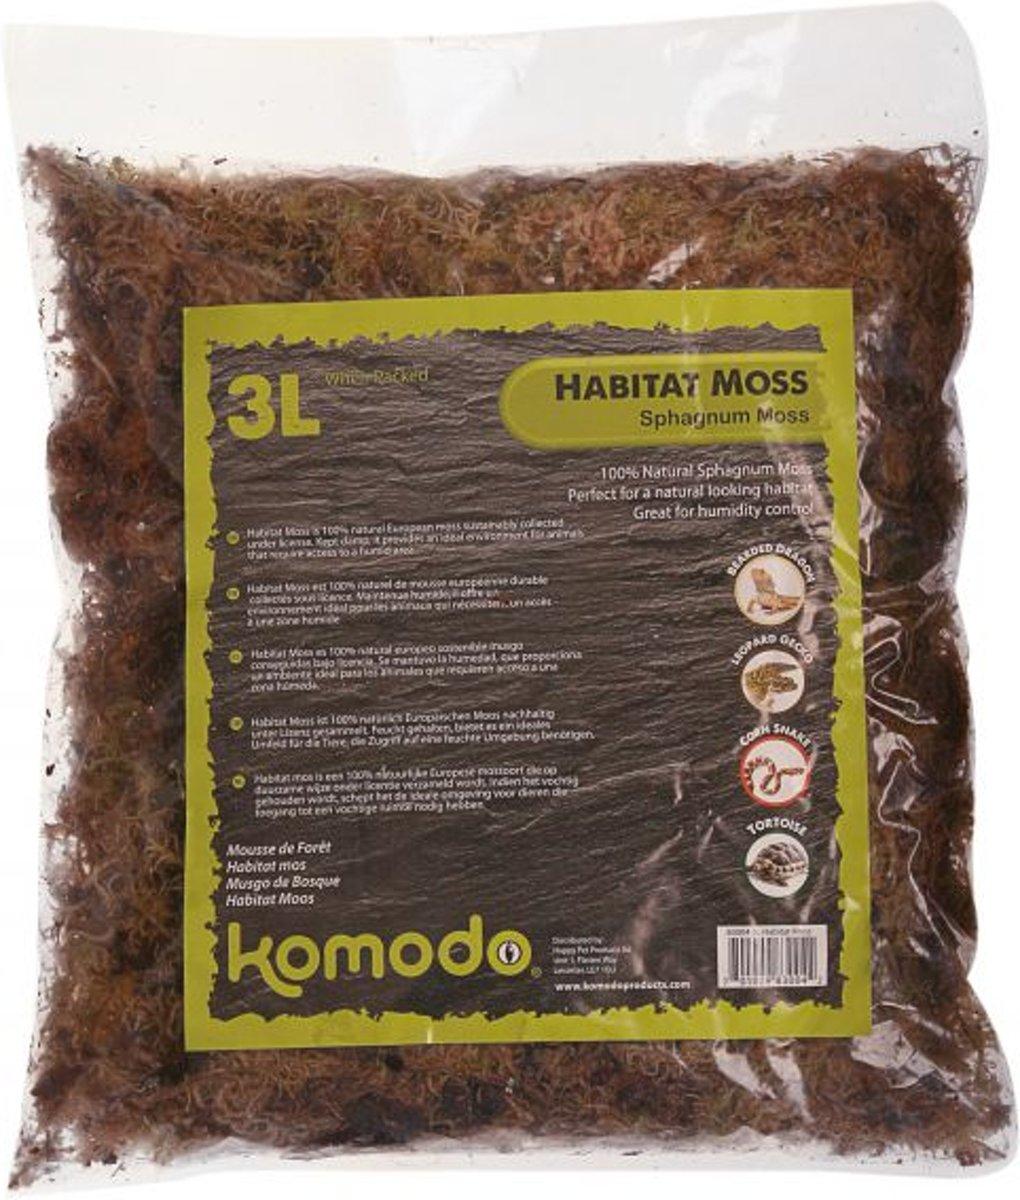 Komodo Habitat Mos - 3 l